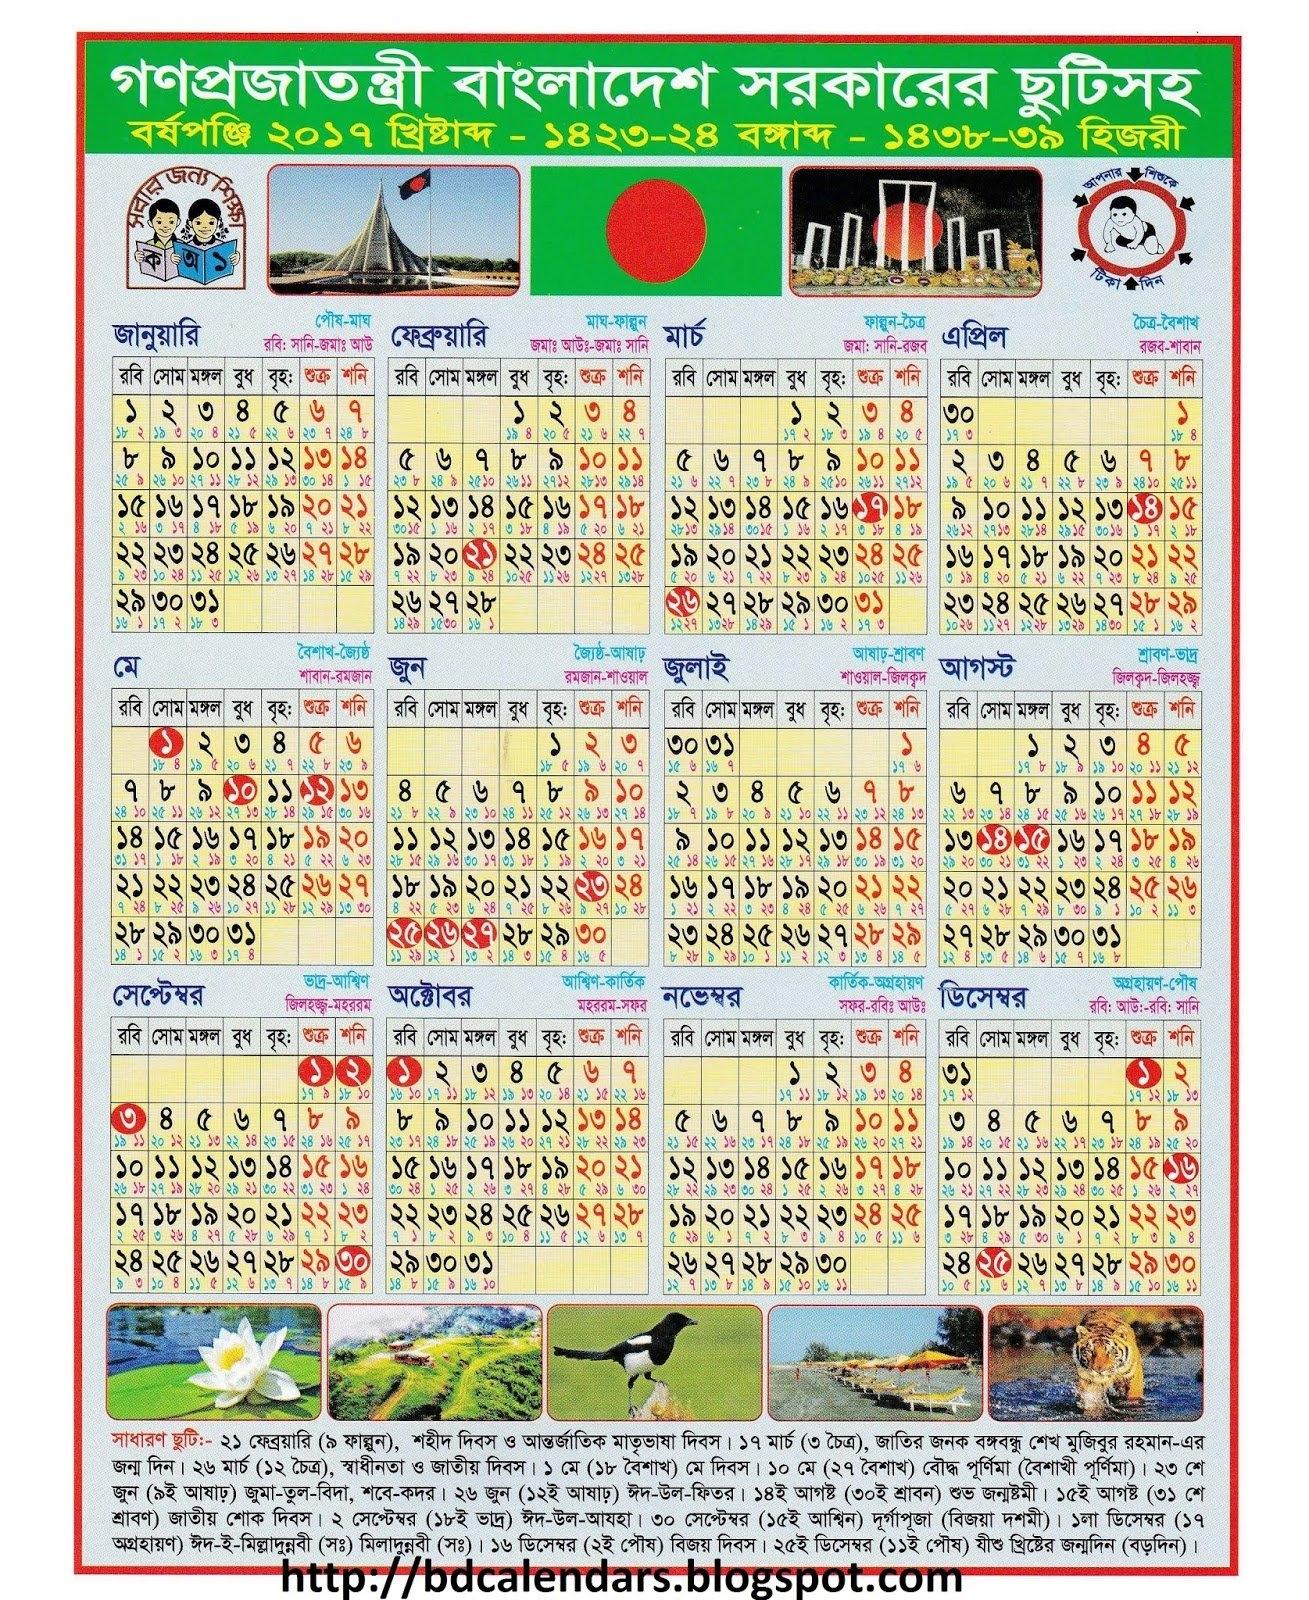 Bangladesh Government Calendar With Holidays with regard to Government Calendar 2021 With Holidays Bangladesh Graphics